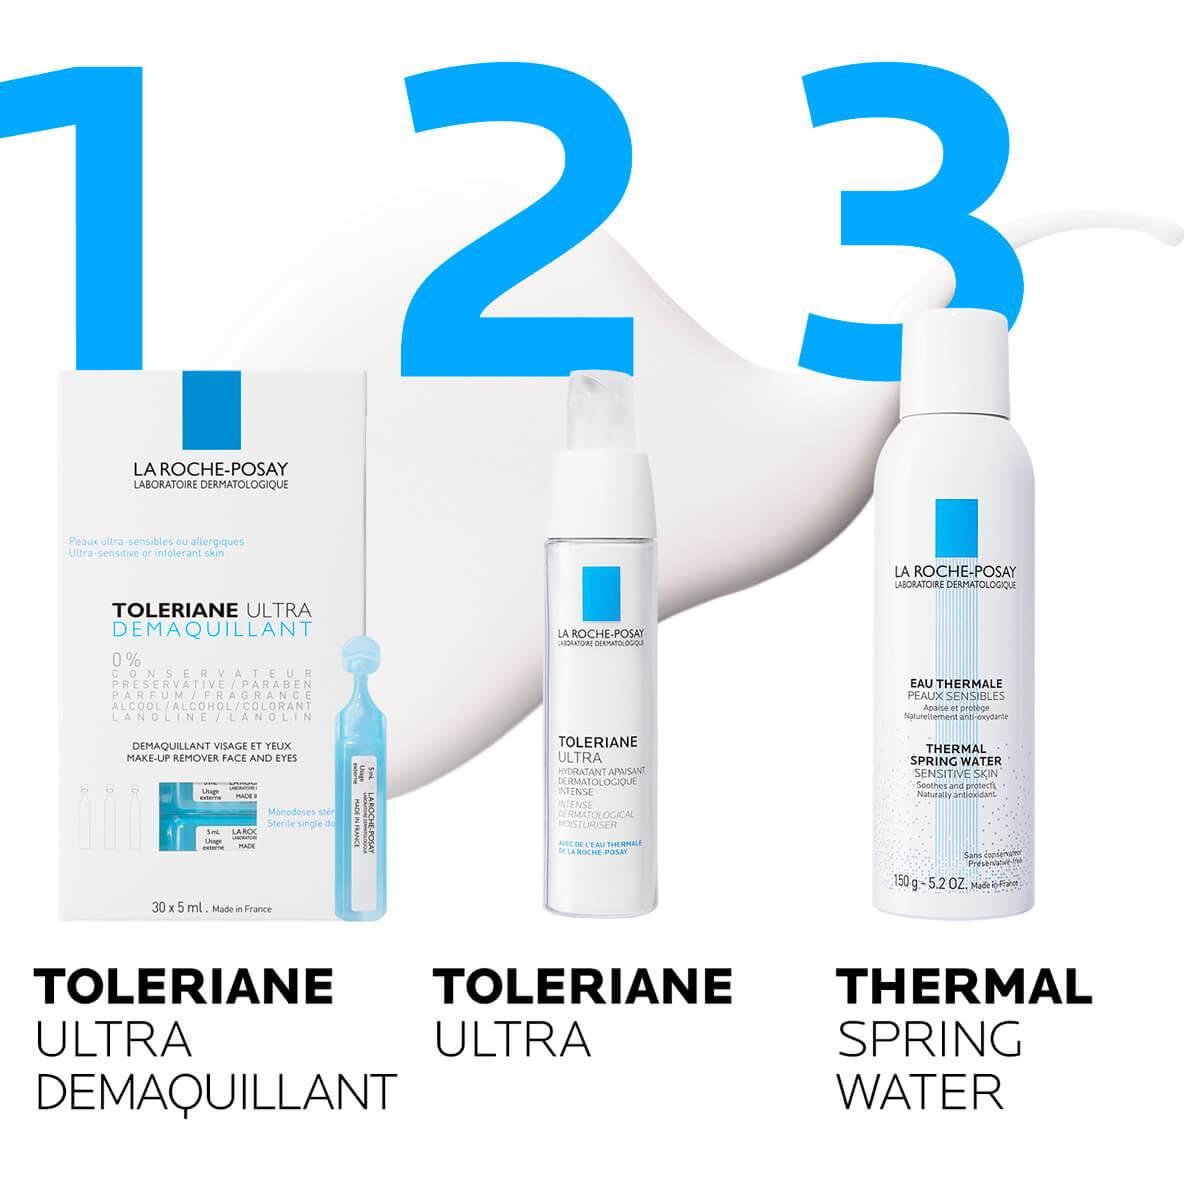 LaRochePosay-Product-Allergic-Toleriane-Ultra-40ml routine